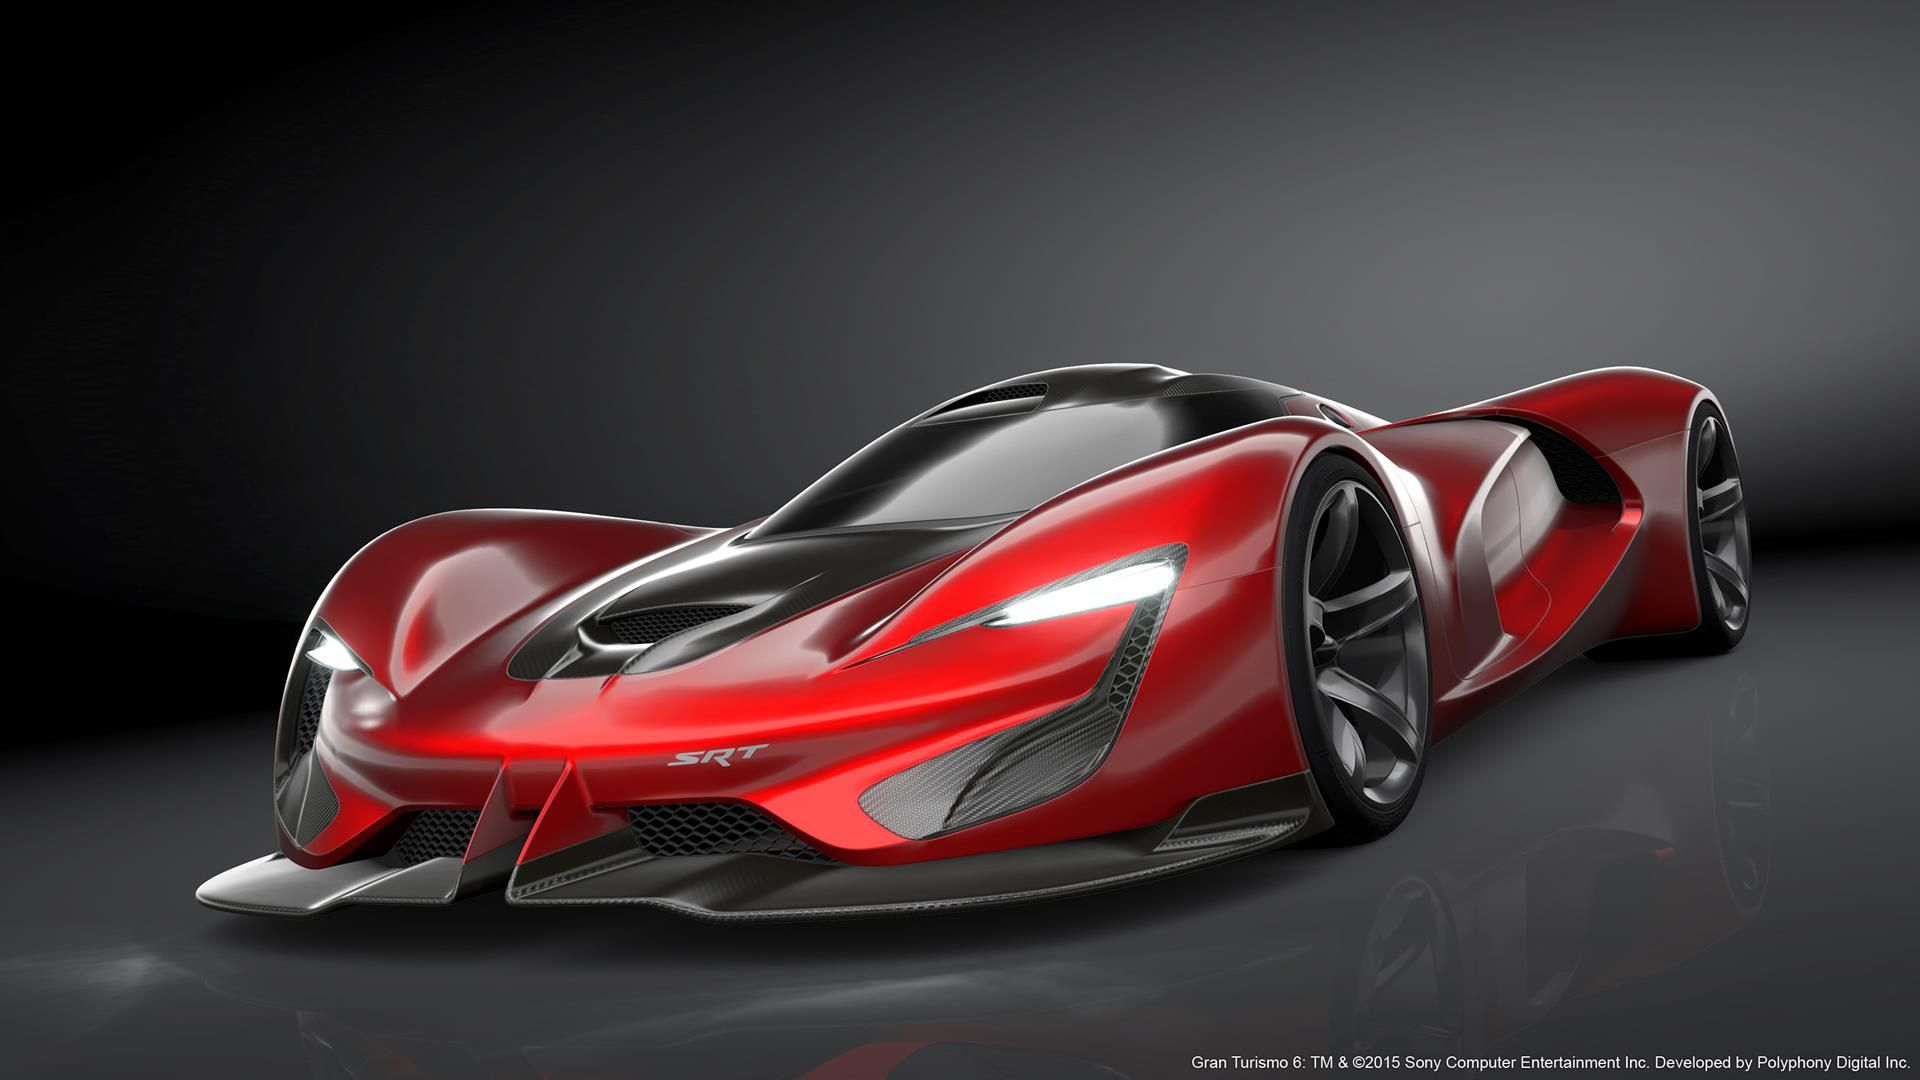 Pin by PELLEGRINO on SUPER COOL... Srt, Super cars